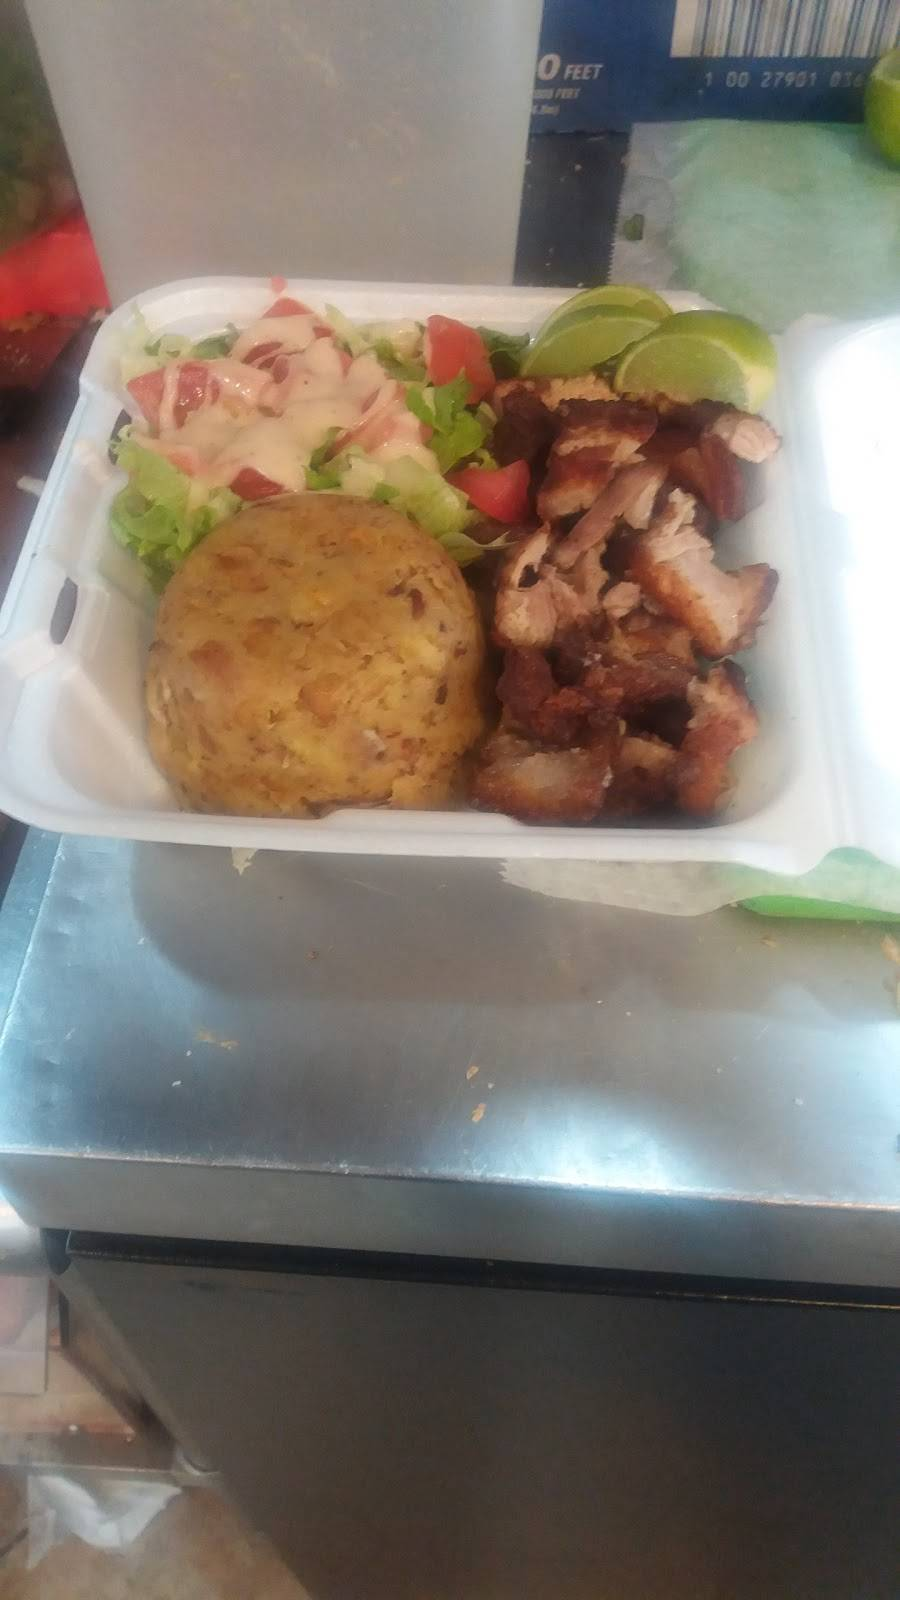 Emergency Snack Bar | restaurant | 1354 Edward L Grant Hwy, Bronx, NY 10452, USA | 3472705445 OR +1 347-270-5445